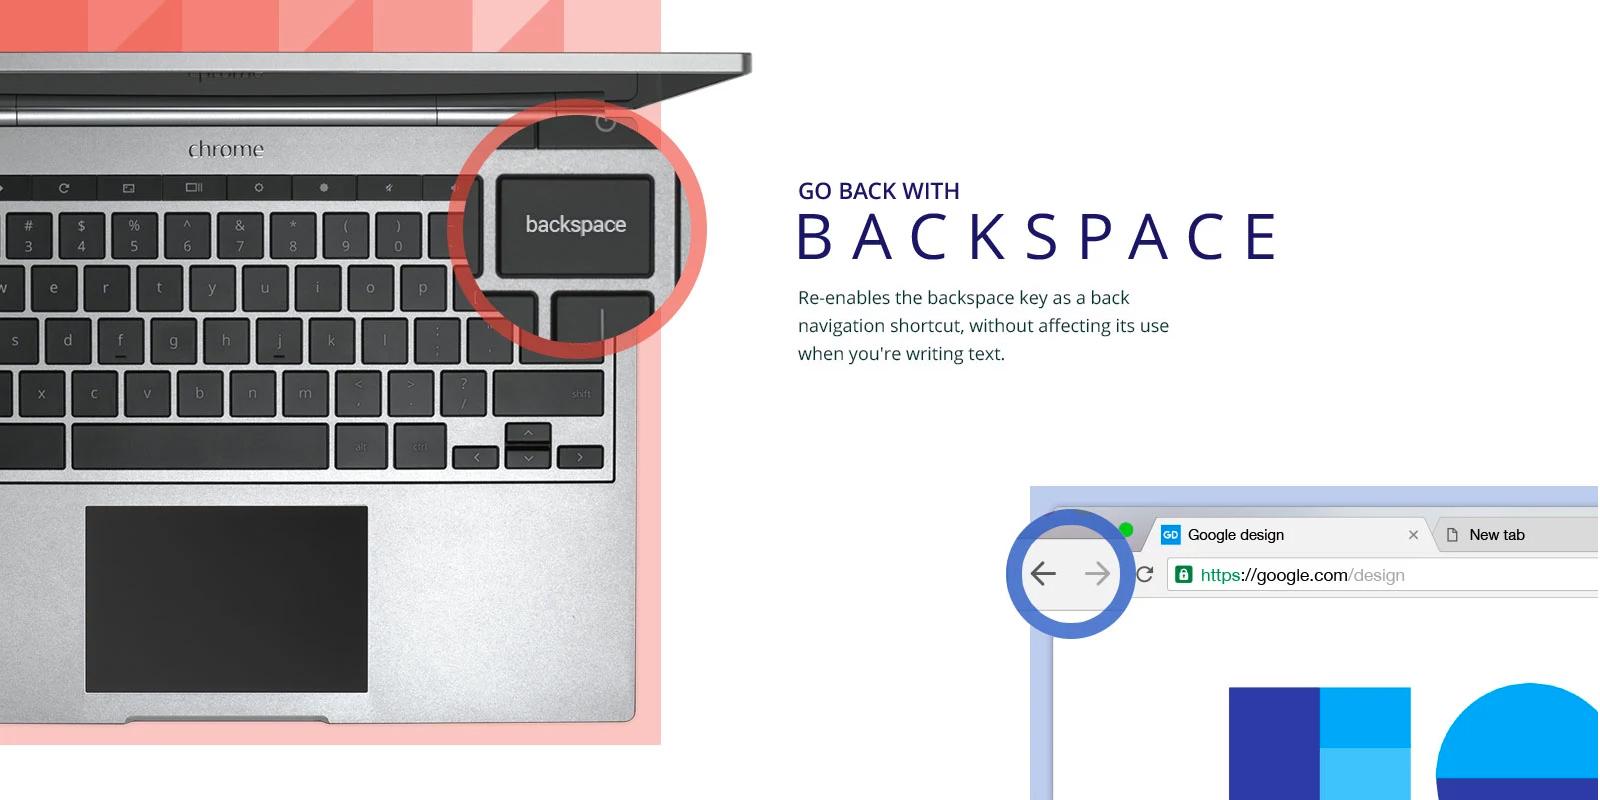 chrome_backspaceextension_1